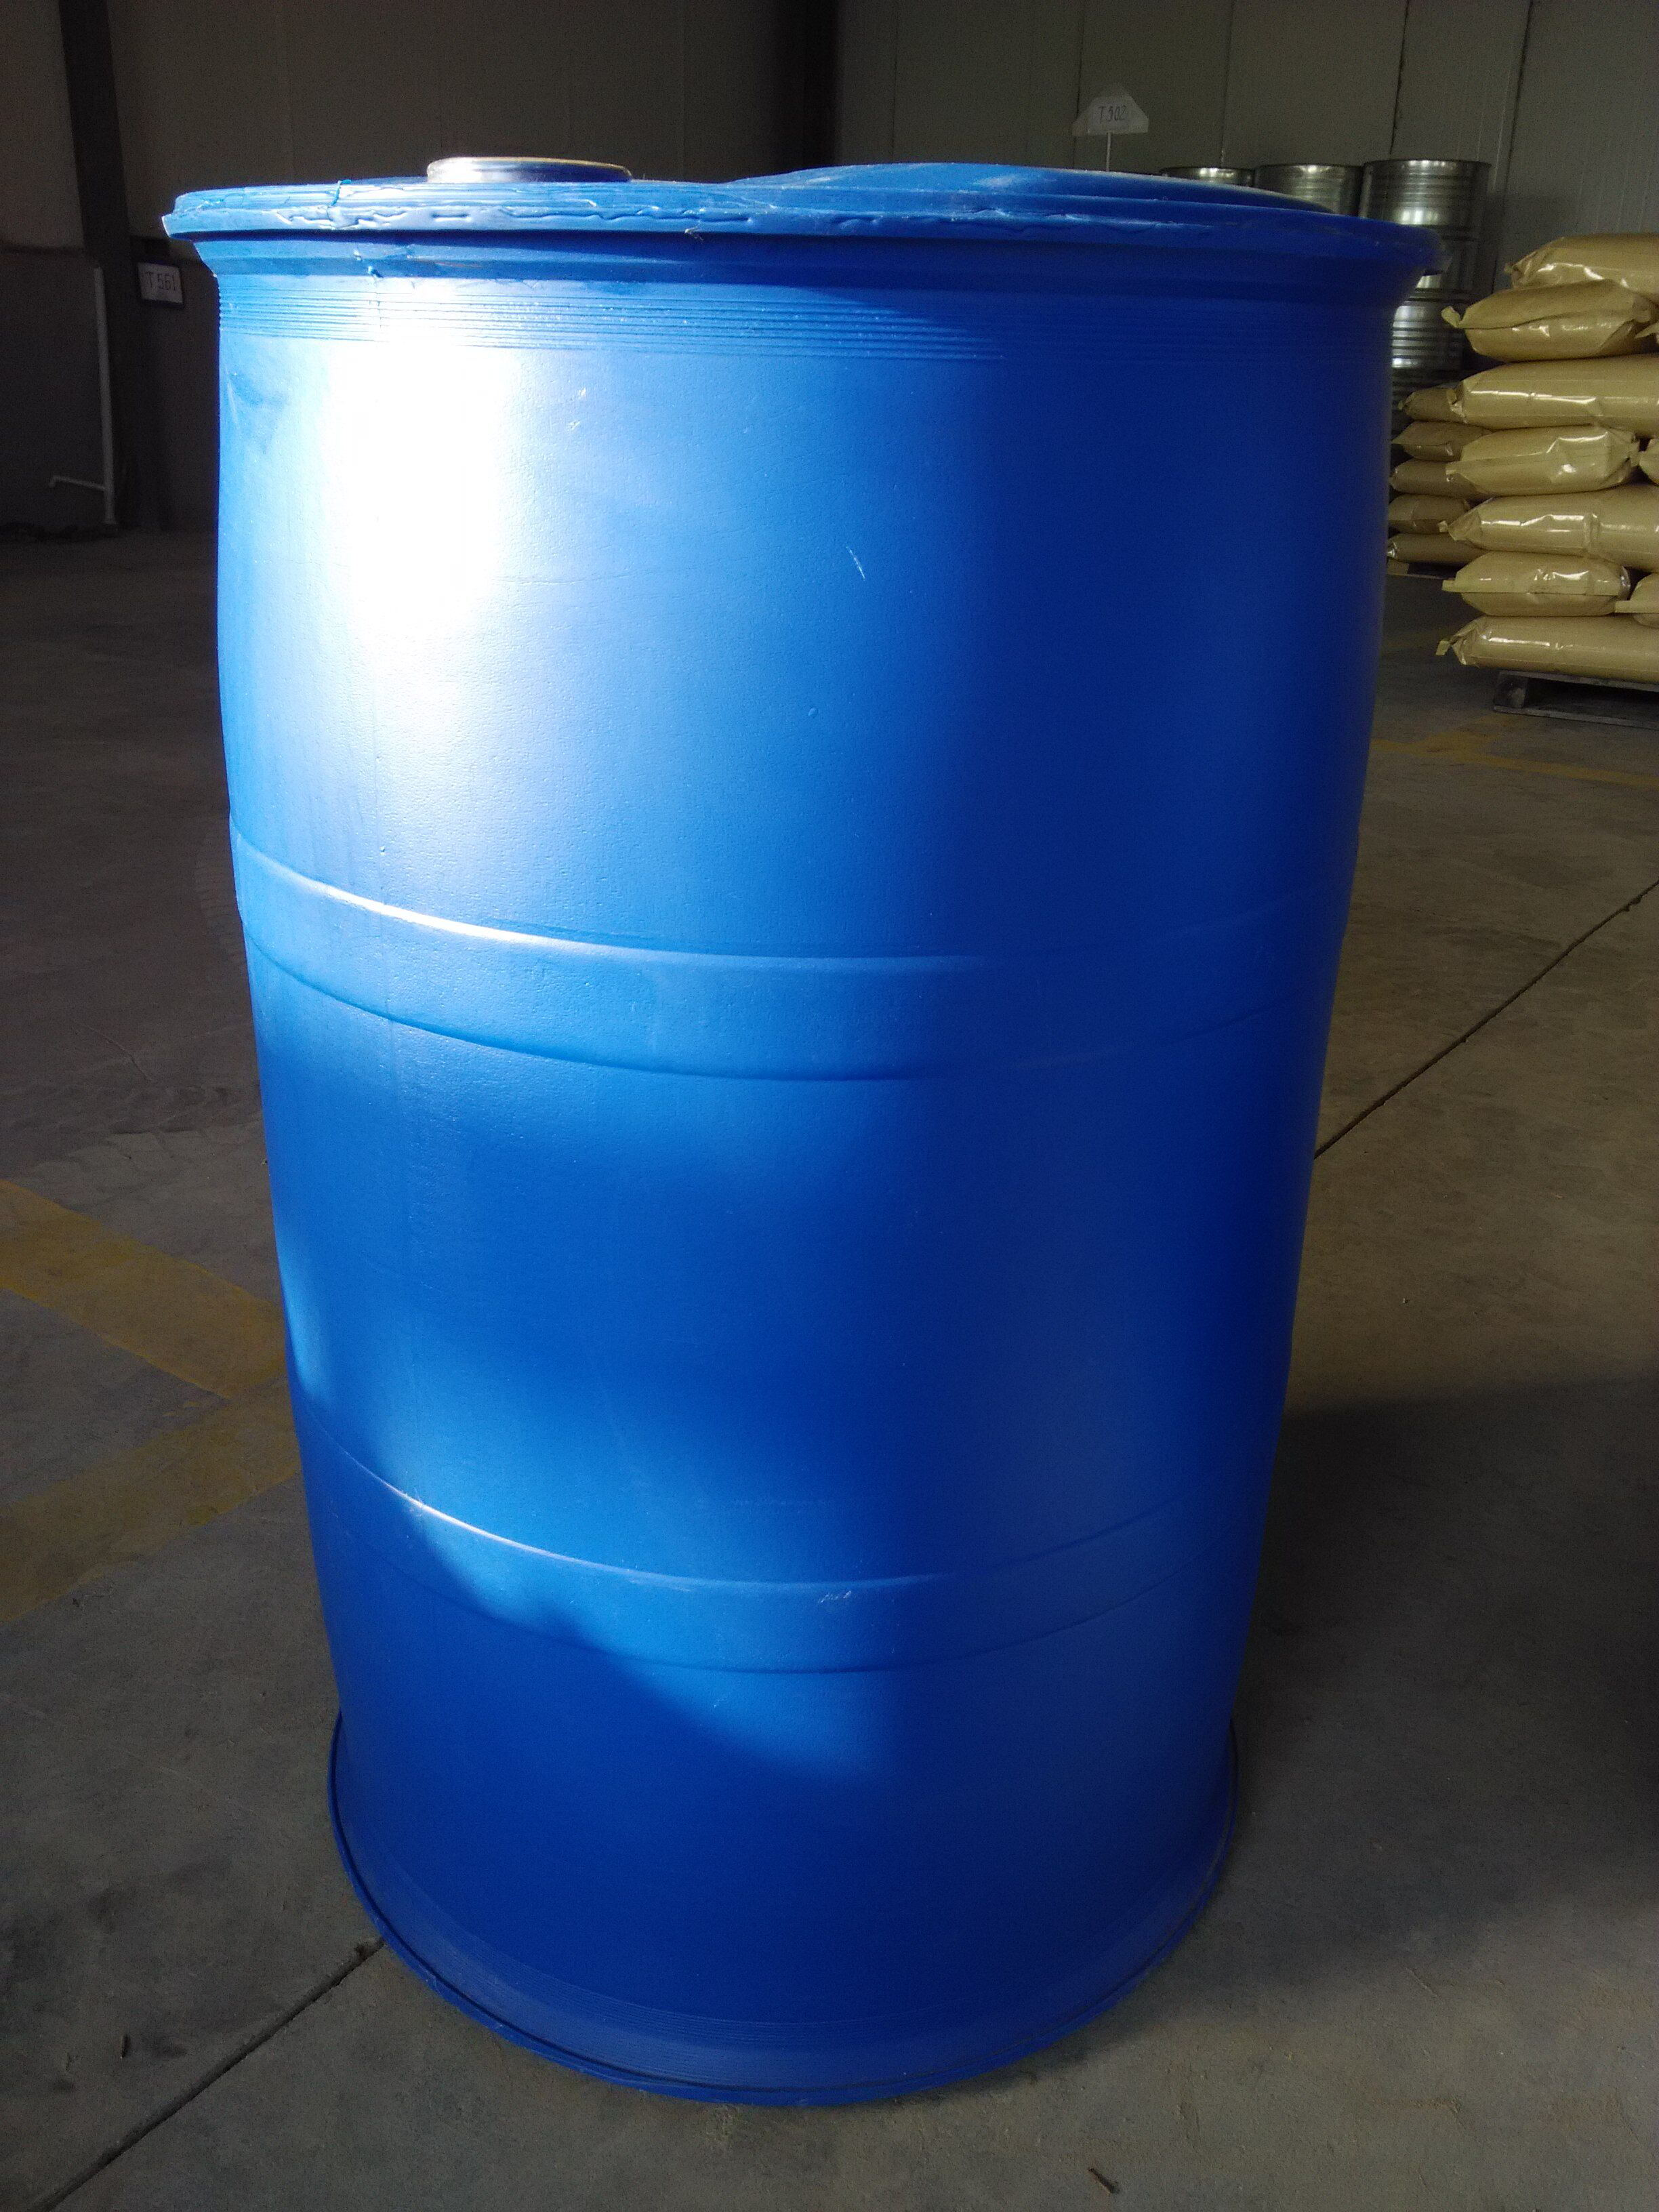 75%4-Hydroxybenzenesulfonic acid;4-hydroxy-benzenesulfonicaci